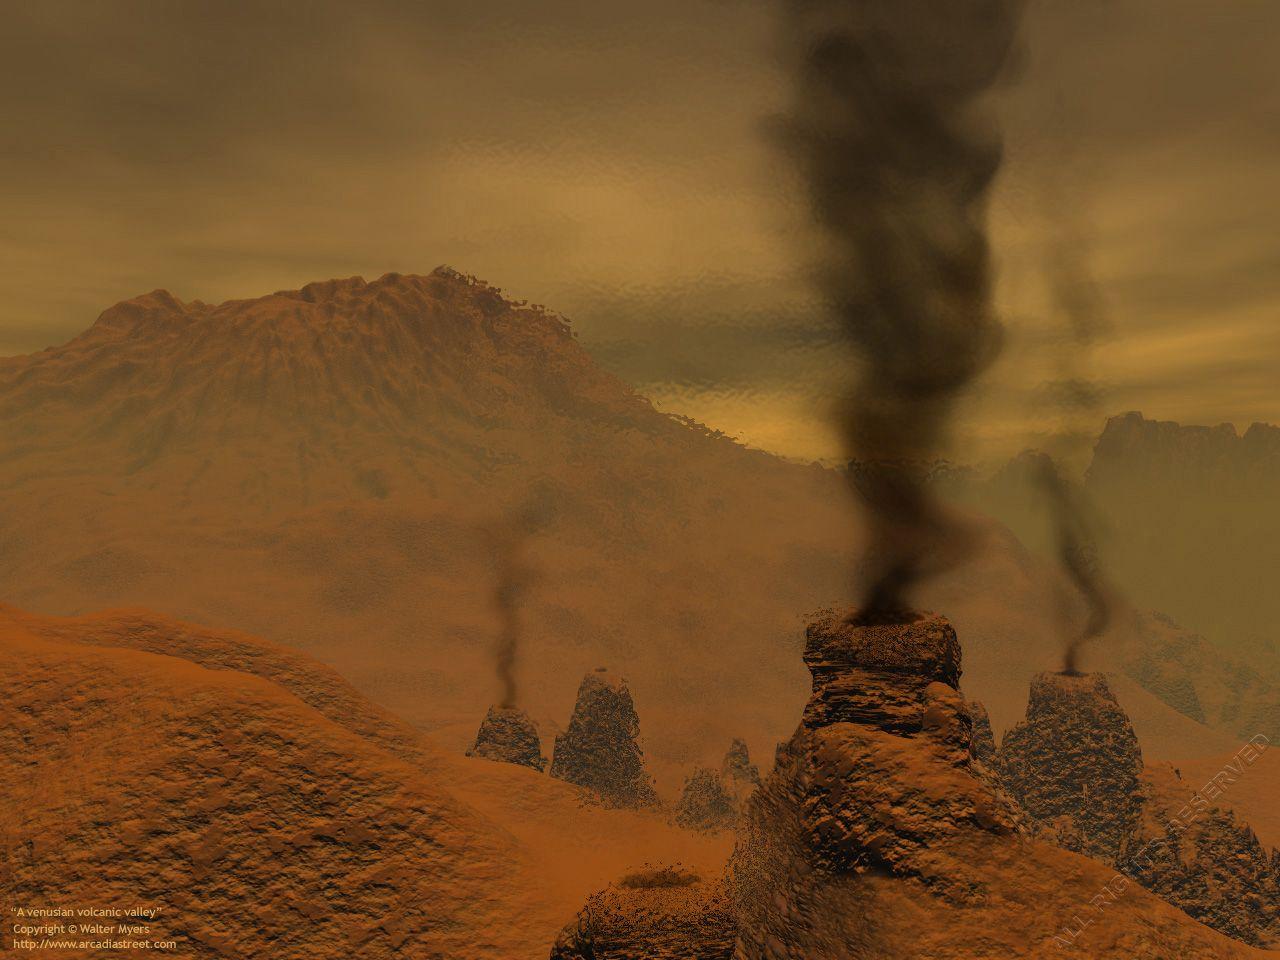 venus surface - Google Search | Life on Venus | Pinterest ...